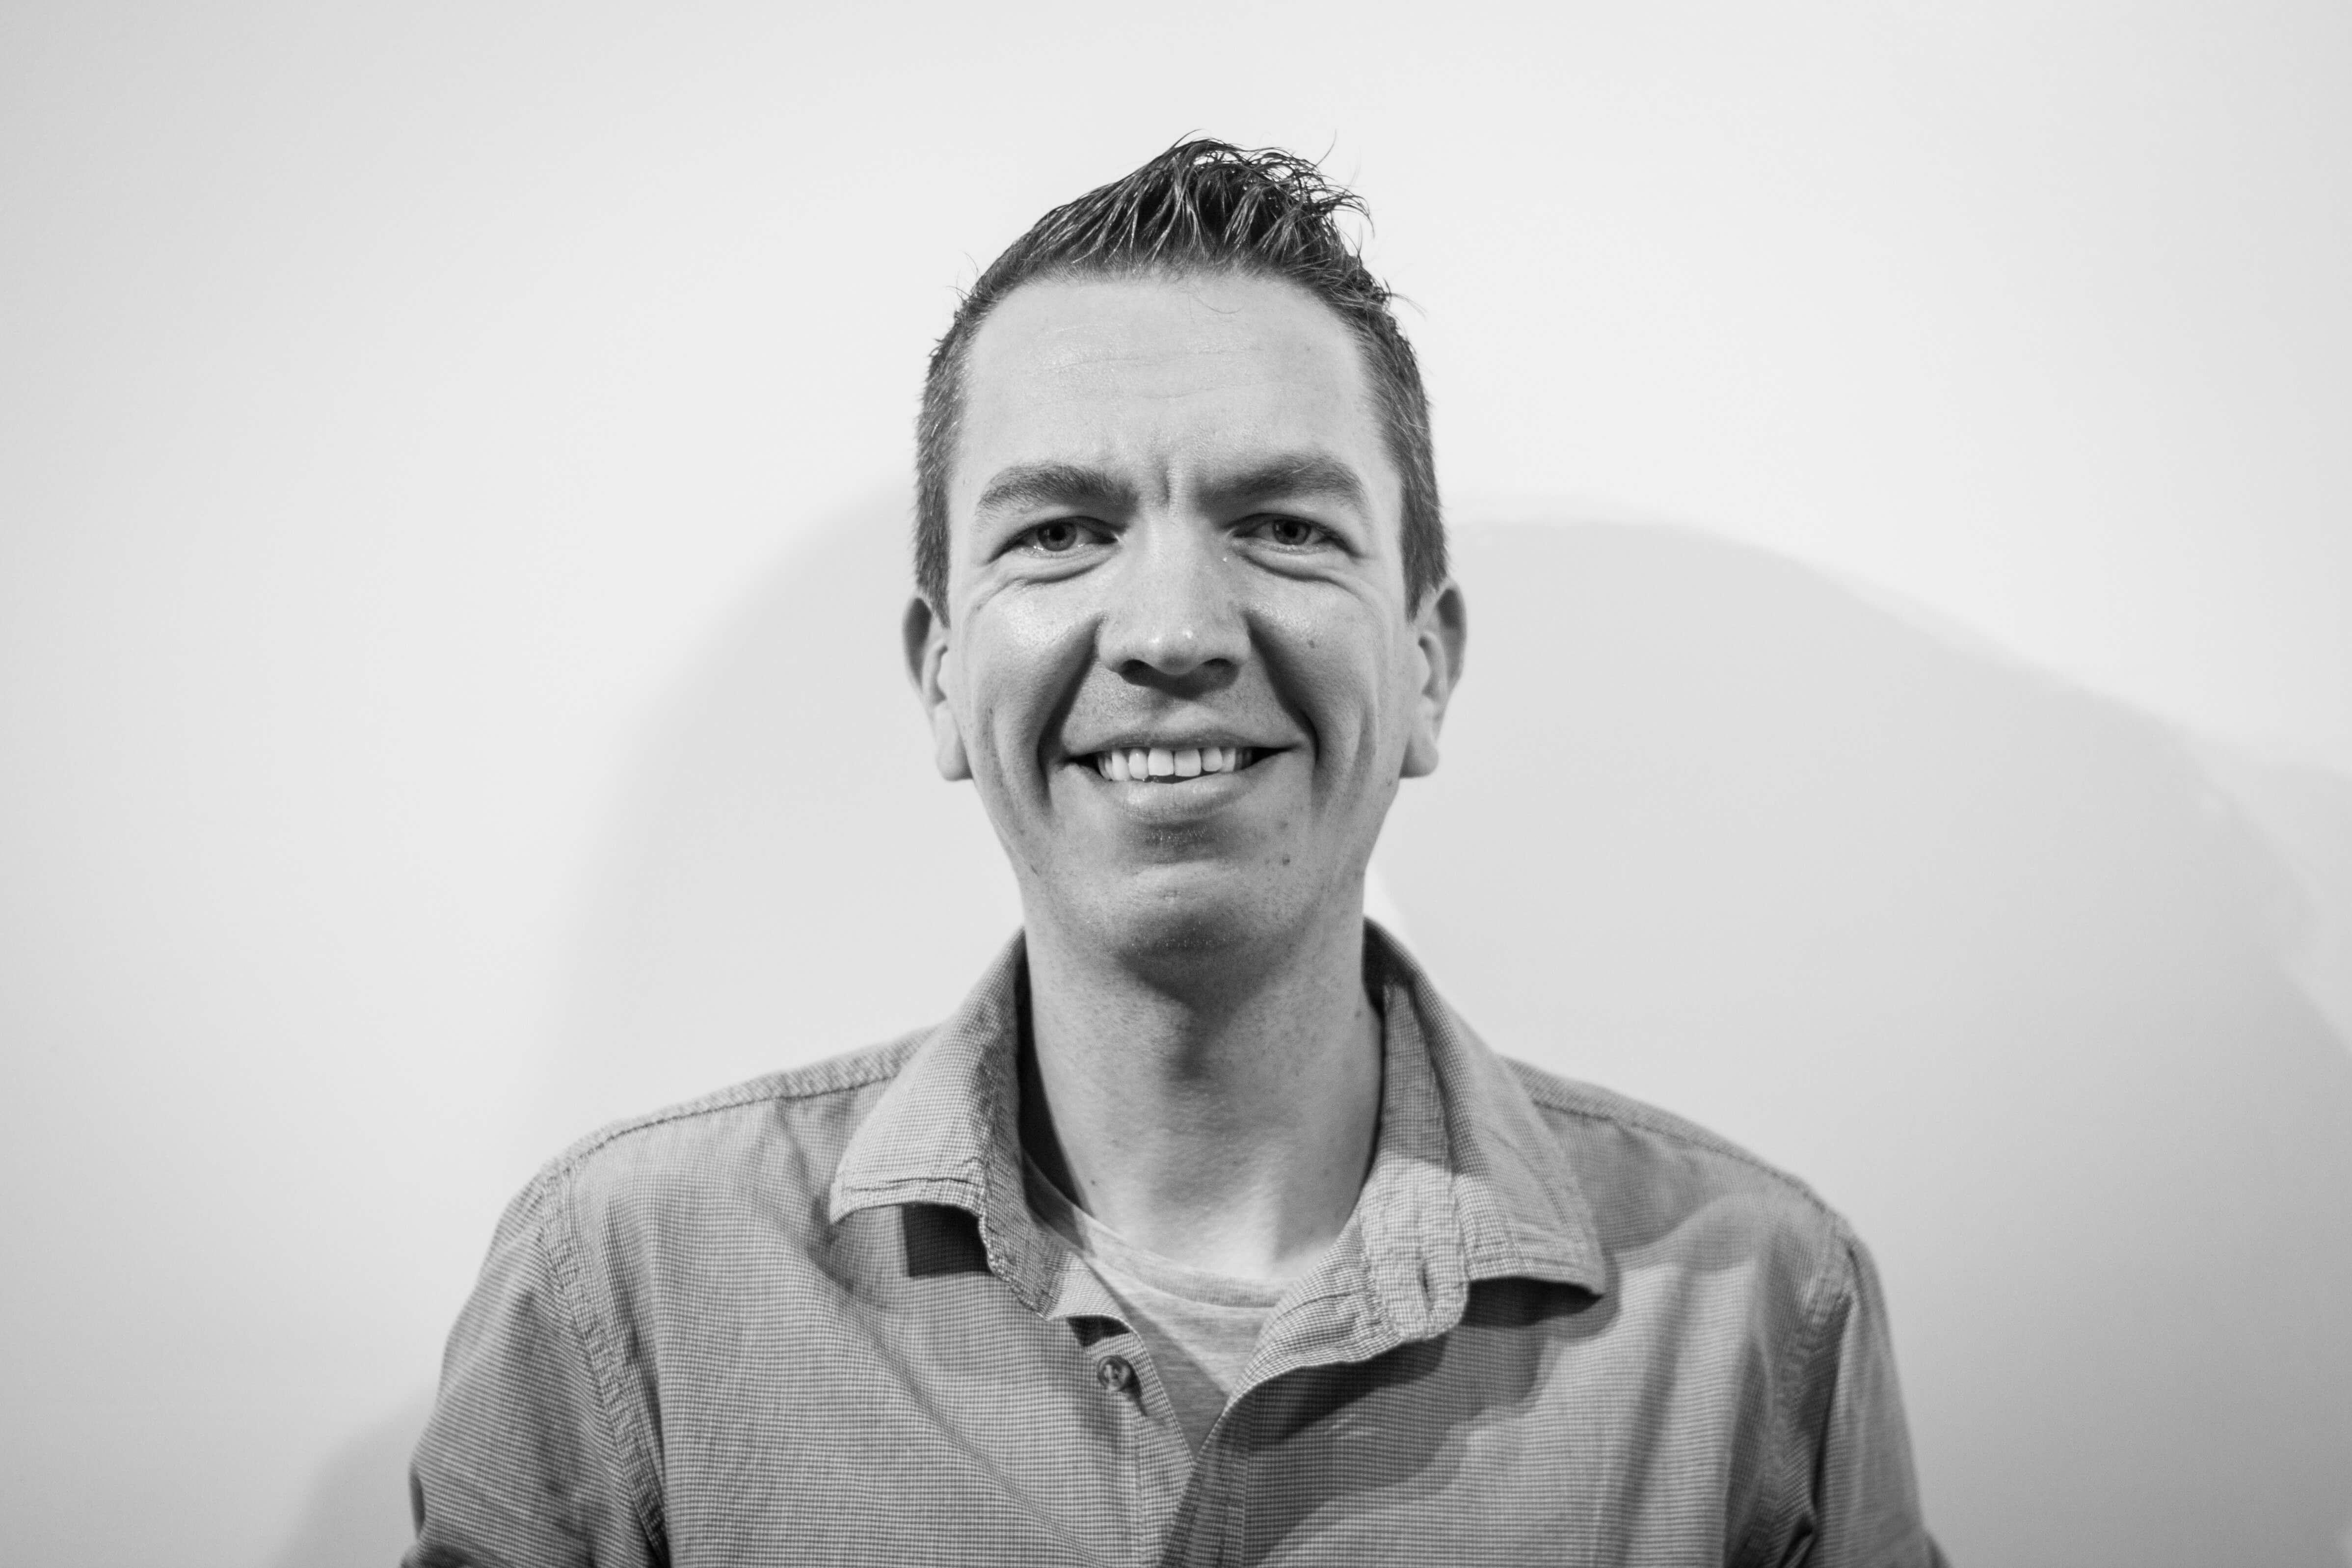 Ian Blanckaert